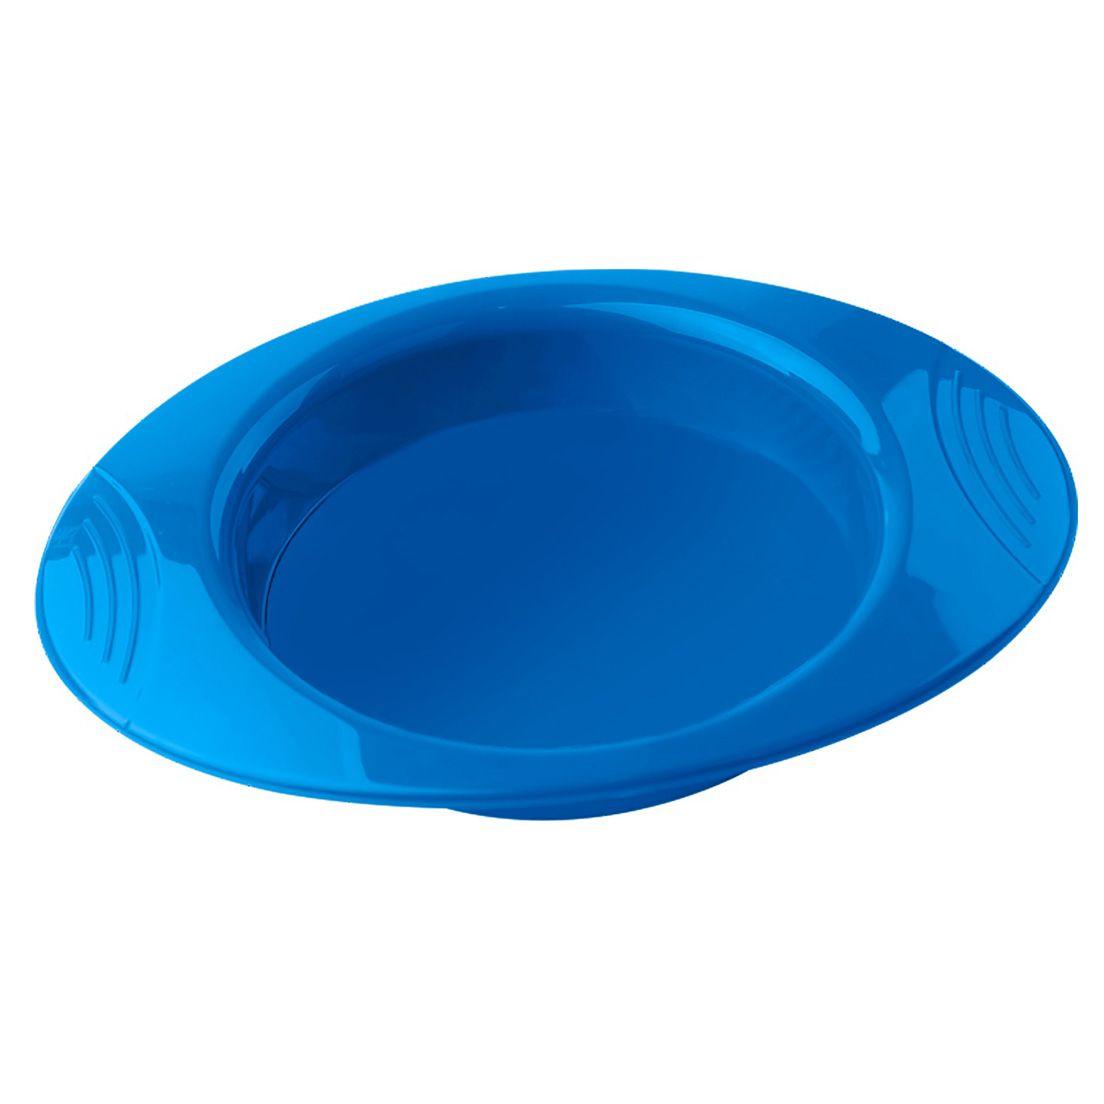 Prato Infantil de Termoplástico Azul 550Ml